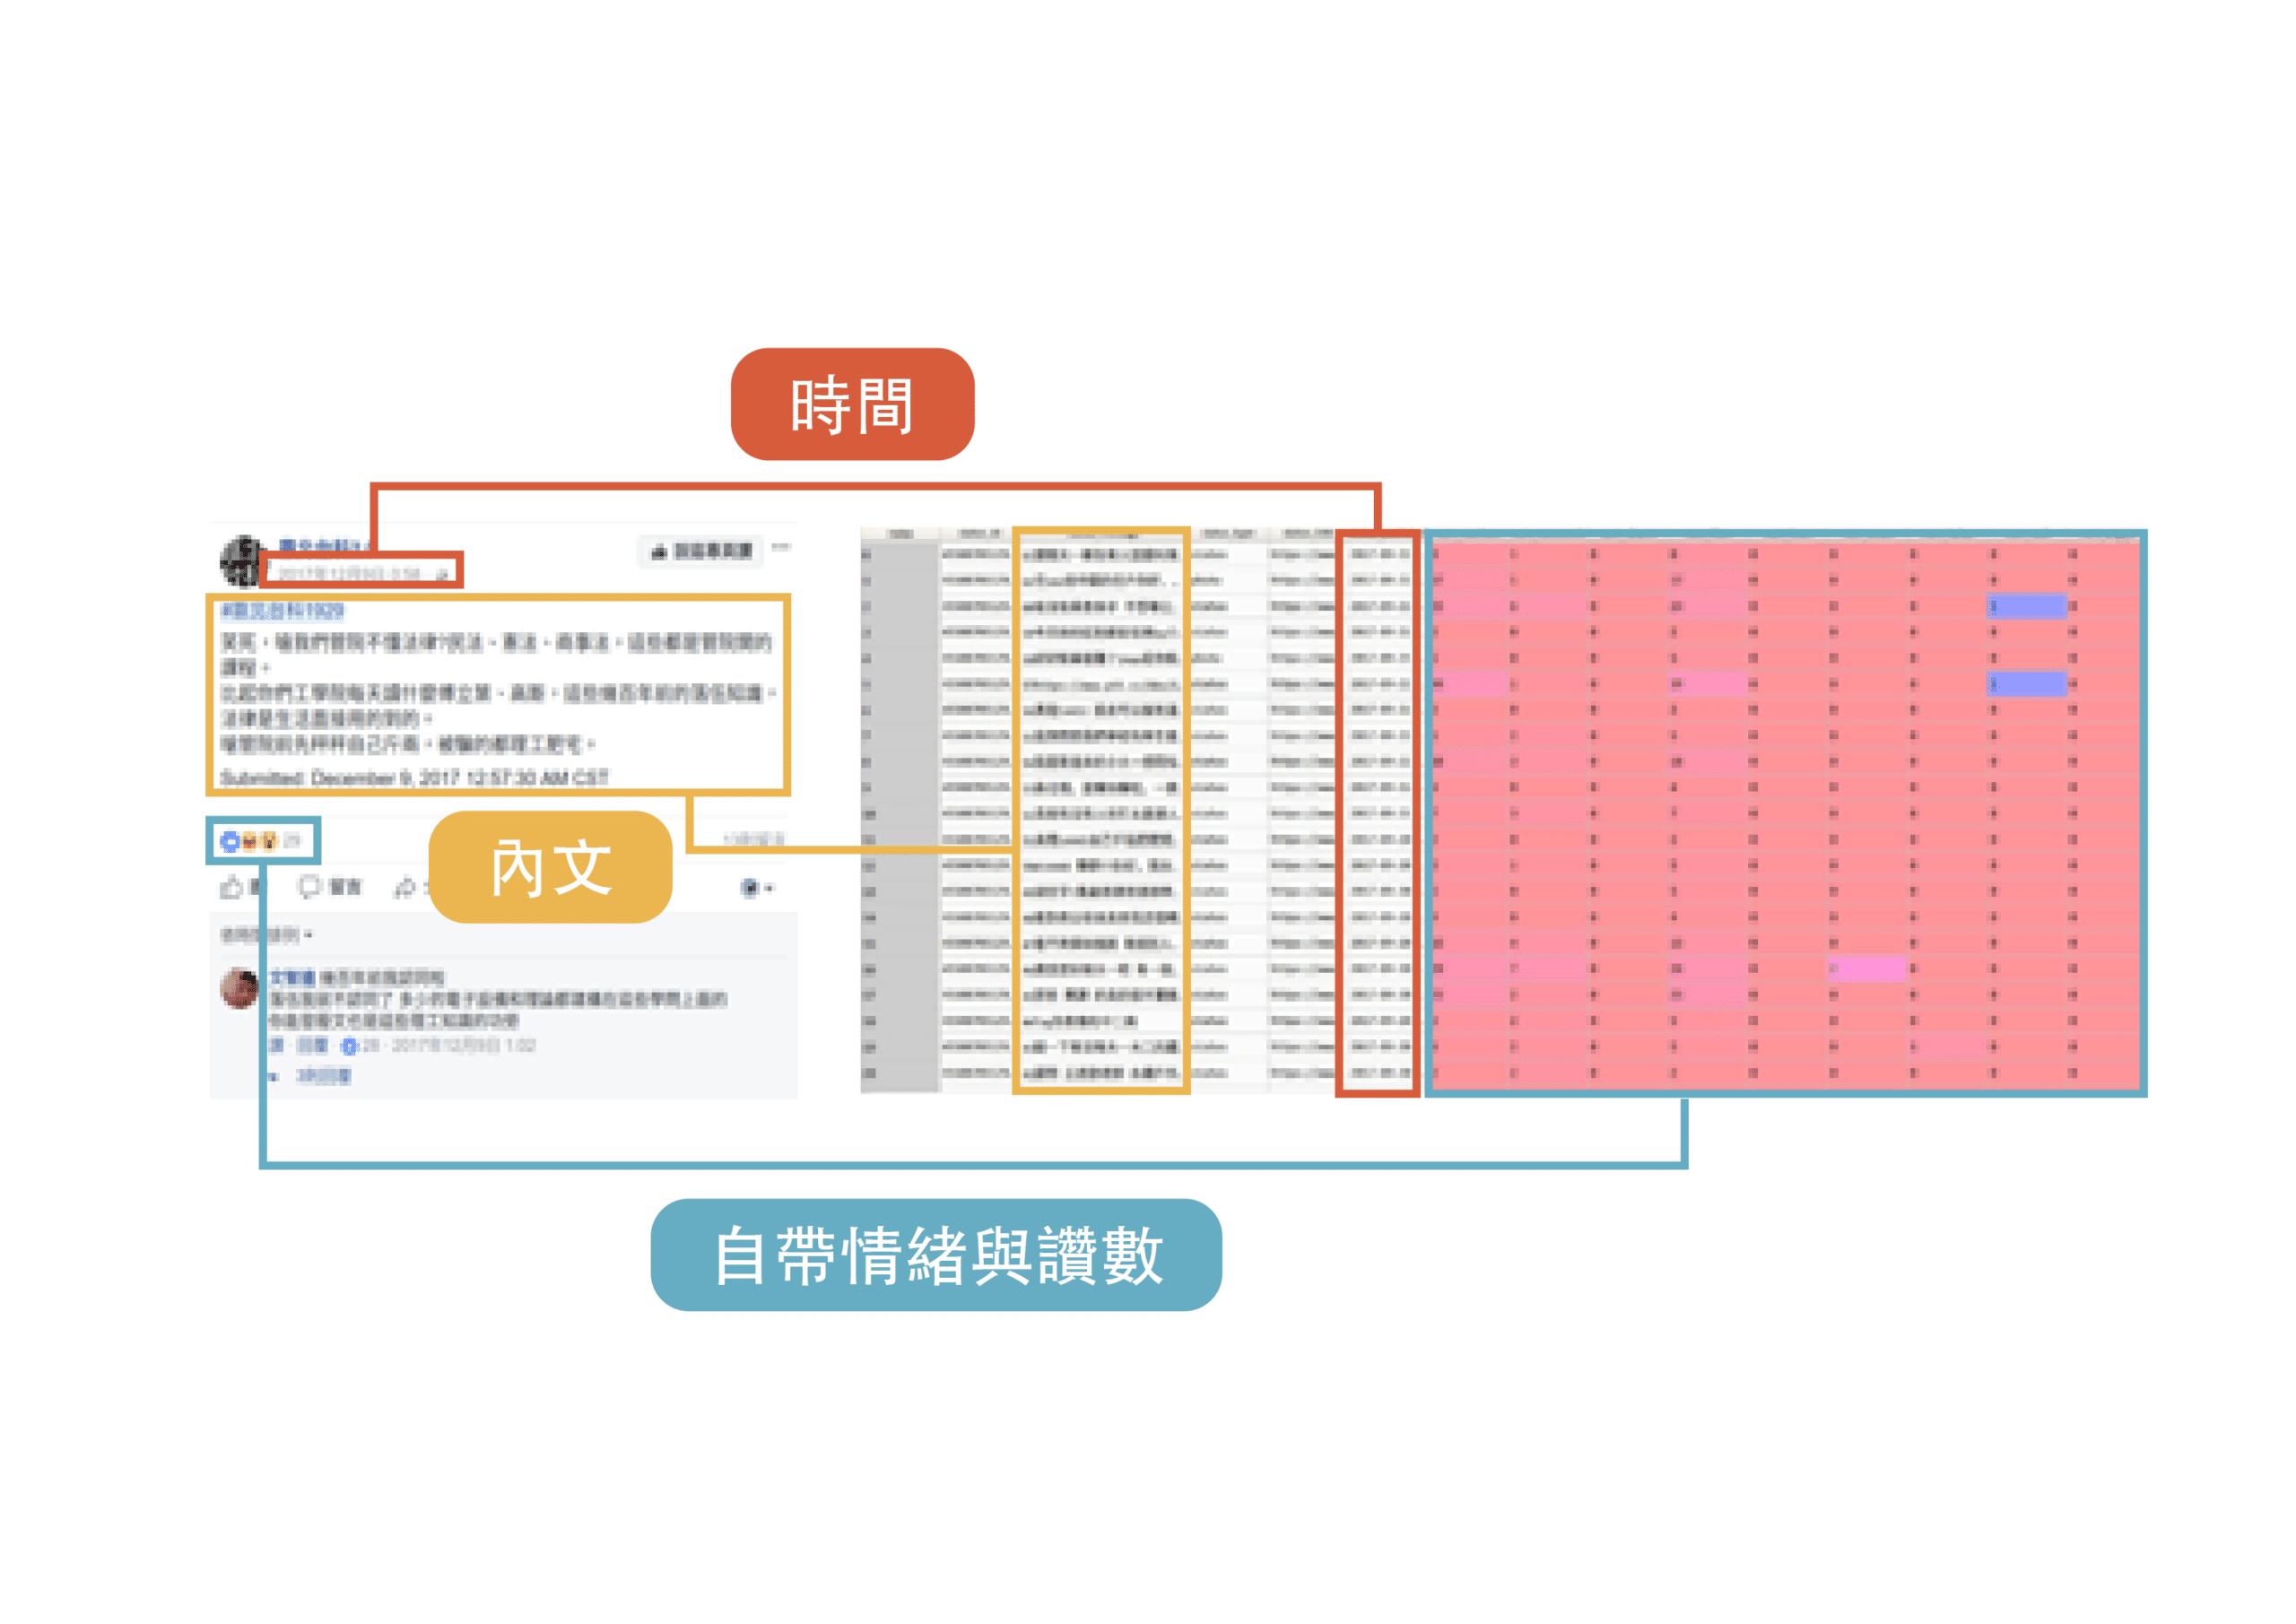 IR小幫手_圖7-6網路口碑文章資料